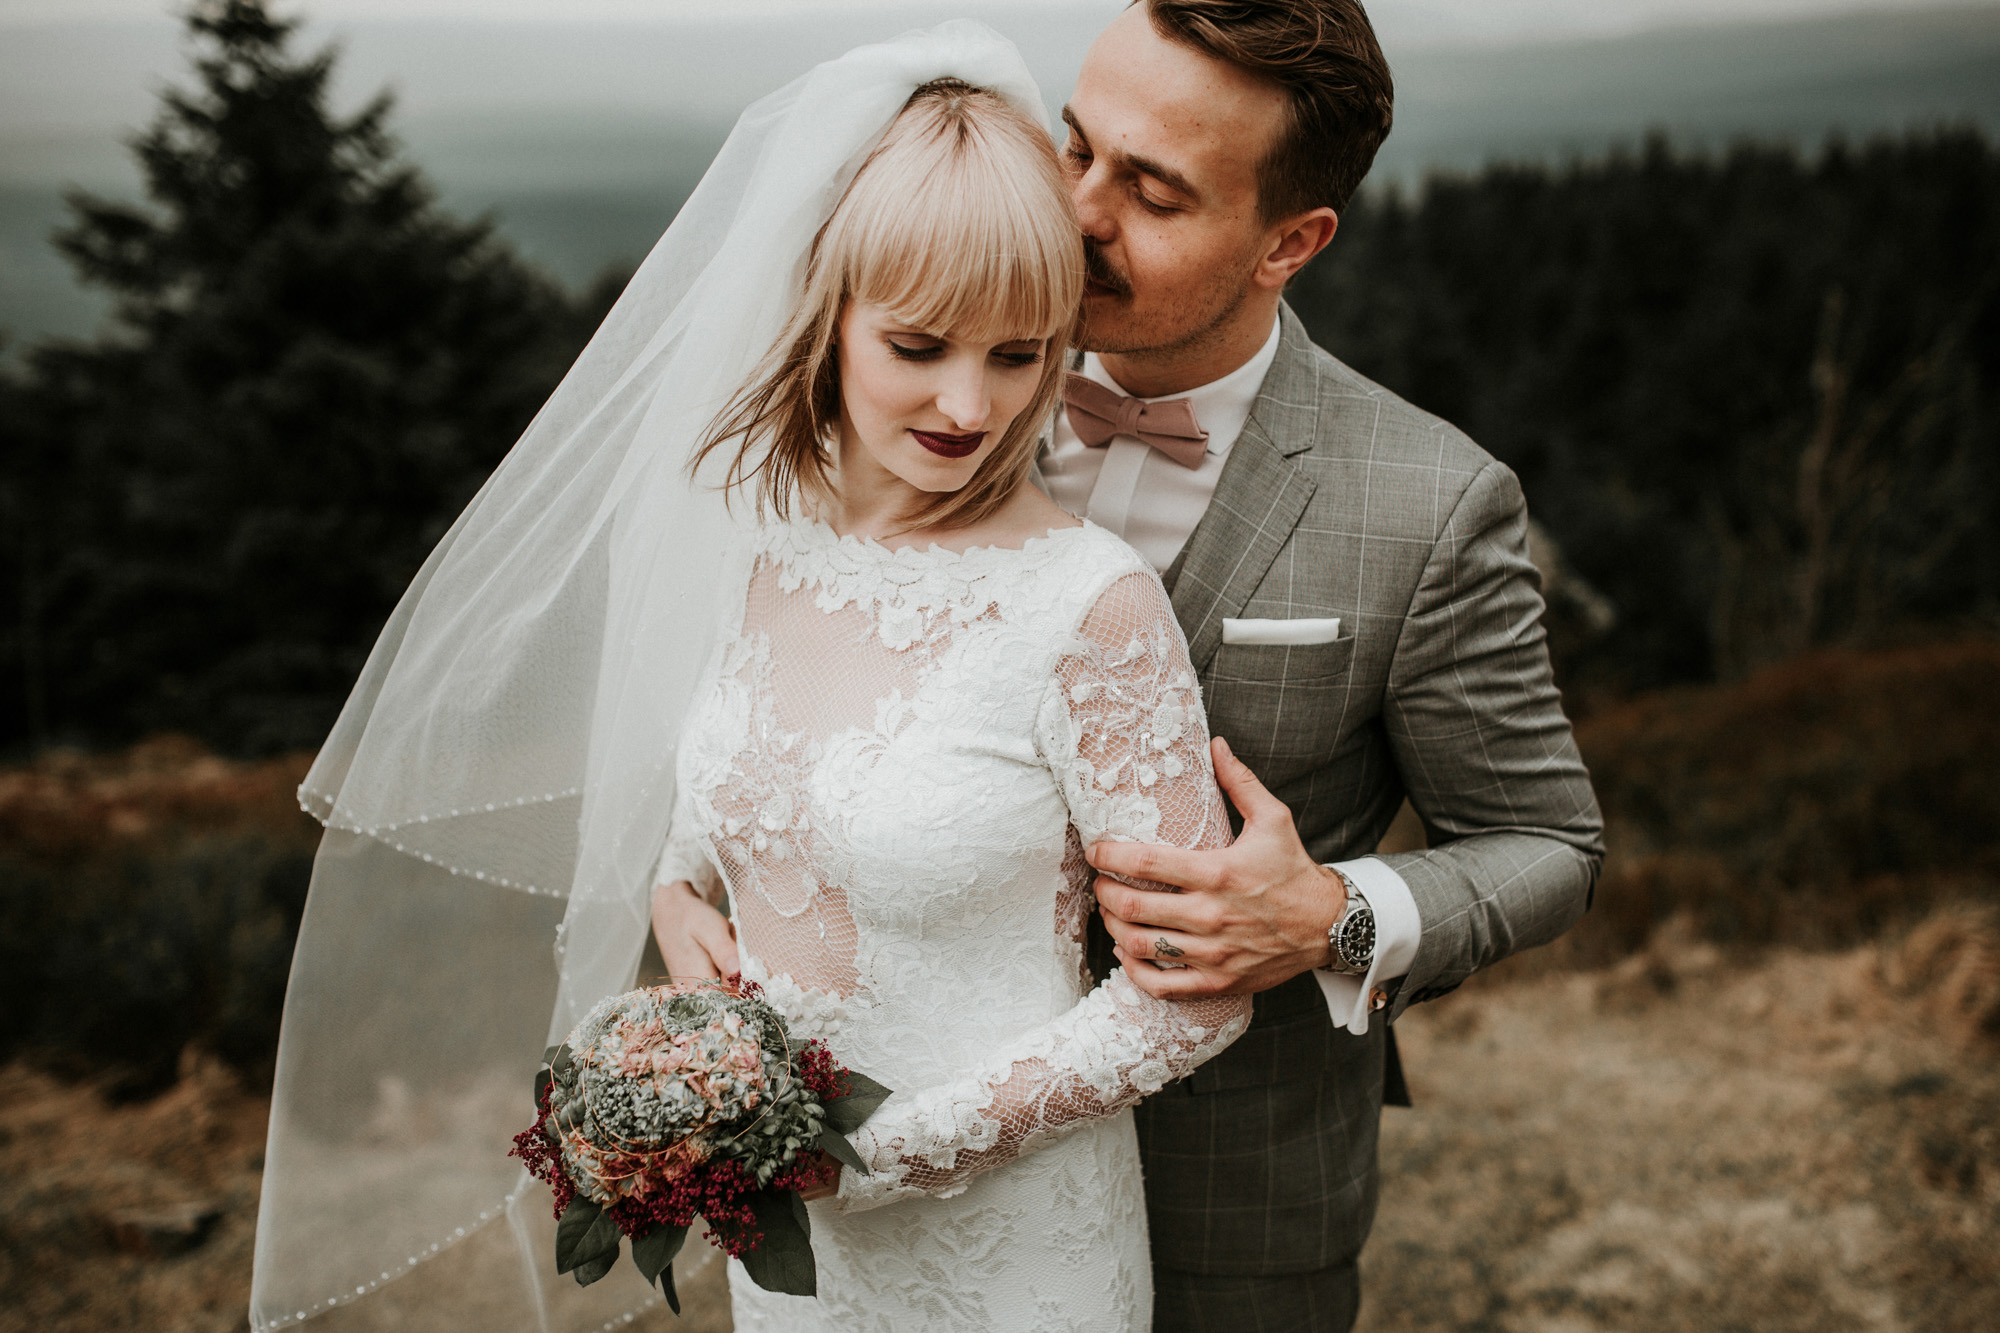 DanielaMarquardtPhotography_Hochzeitsfotograf_Düsseldorf_Köln_Mallorca_Bayern_Austria_Harz_LinaundMaik_Afterwedding-Shooting_Weddingphotographer_Ibiza_Tuskany_Italien_Toskana85